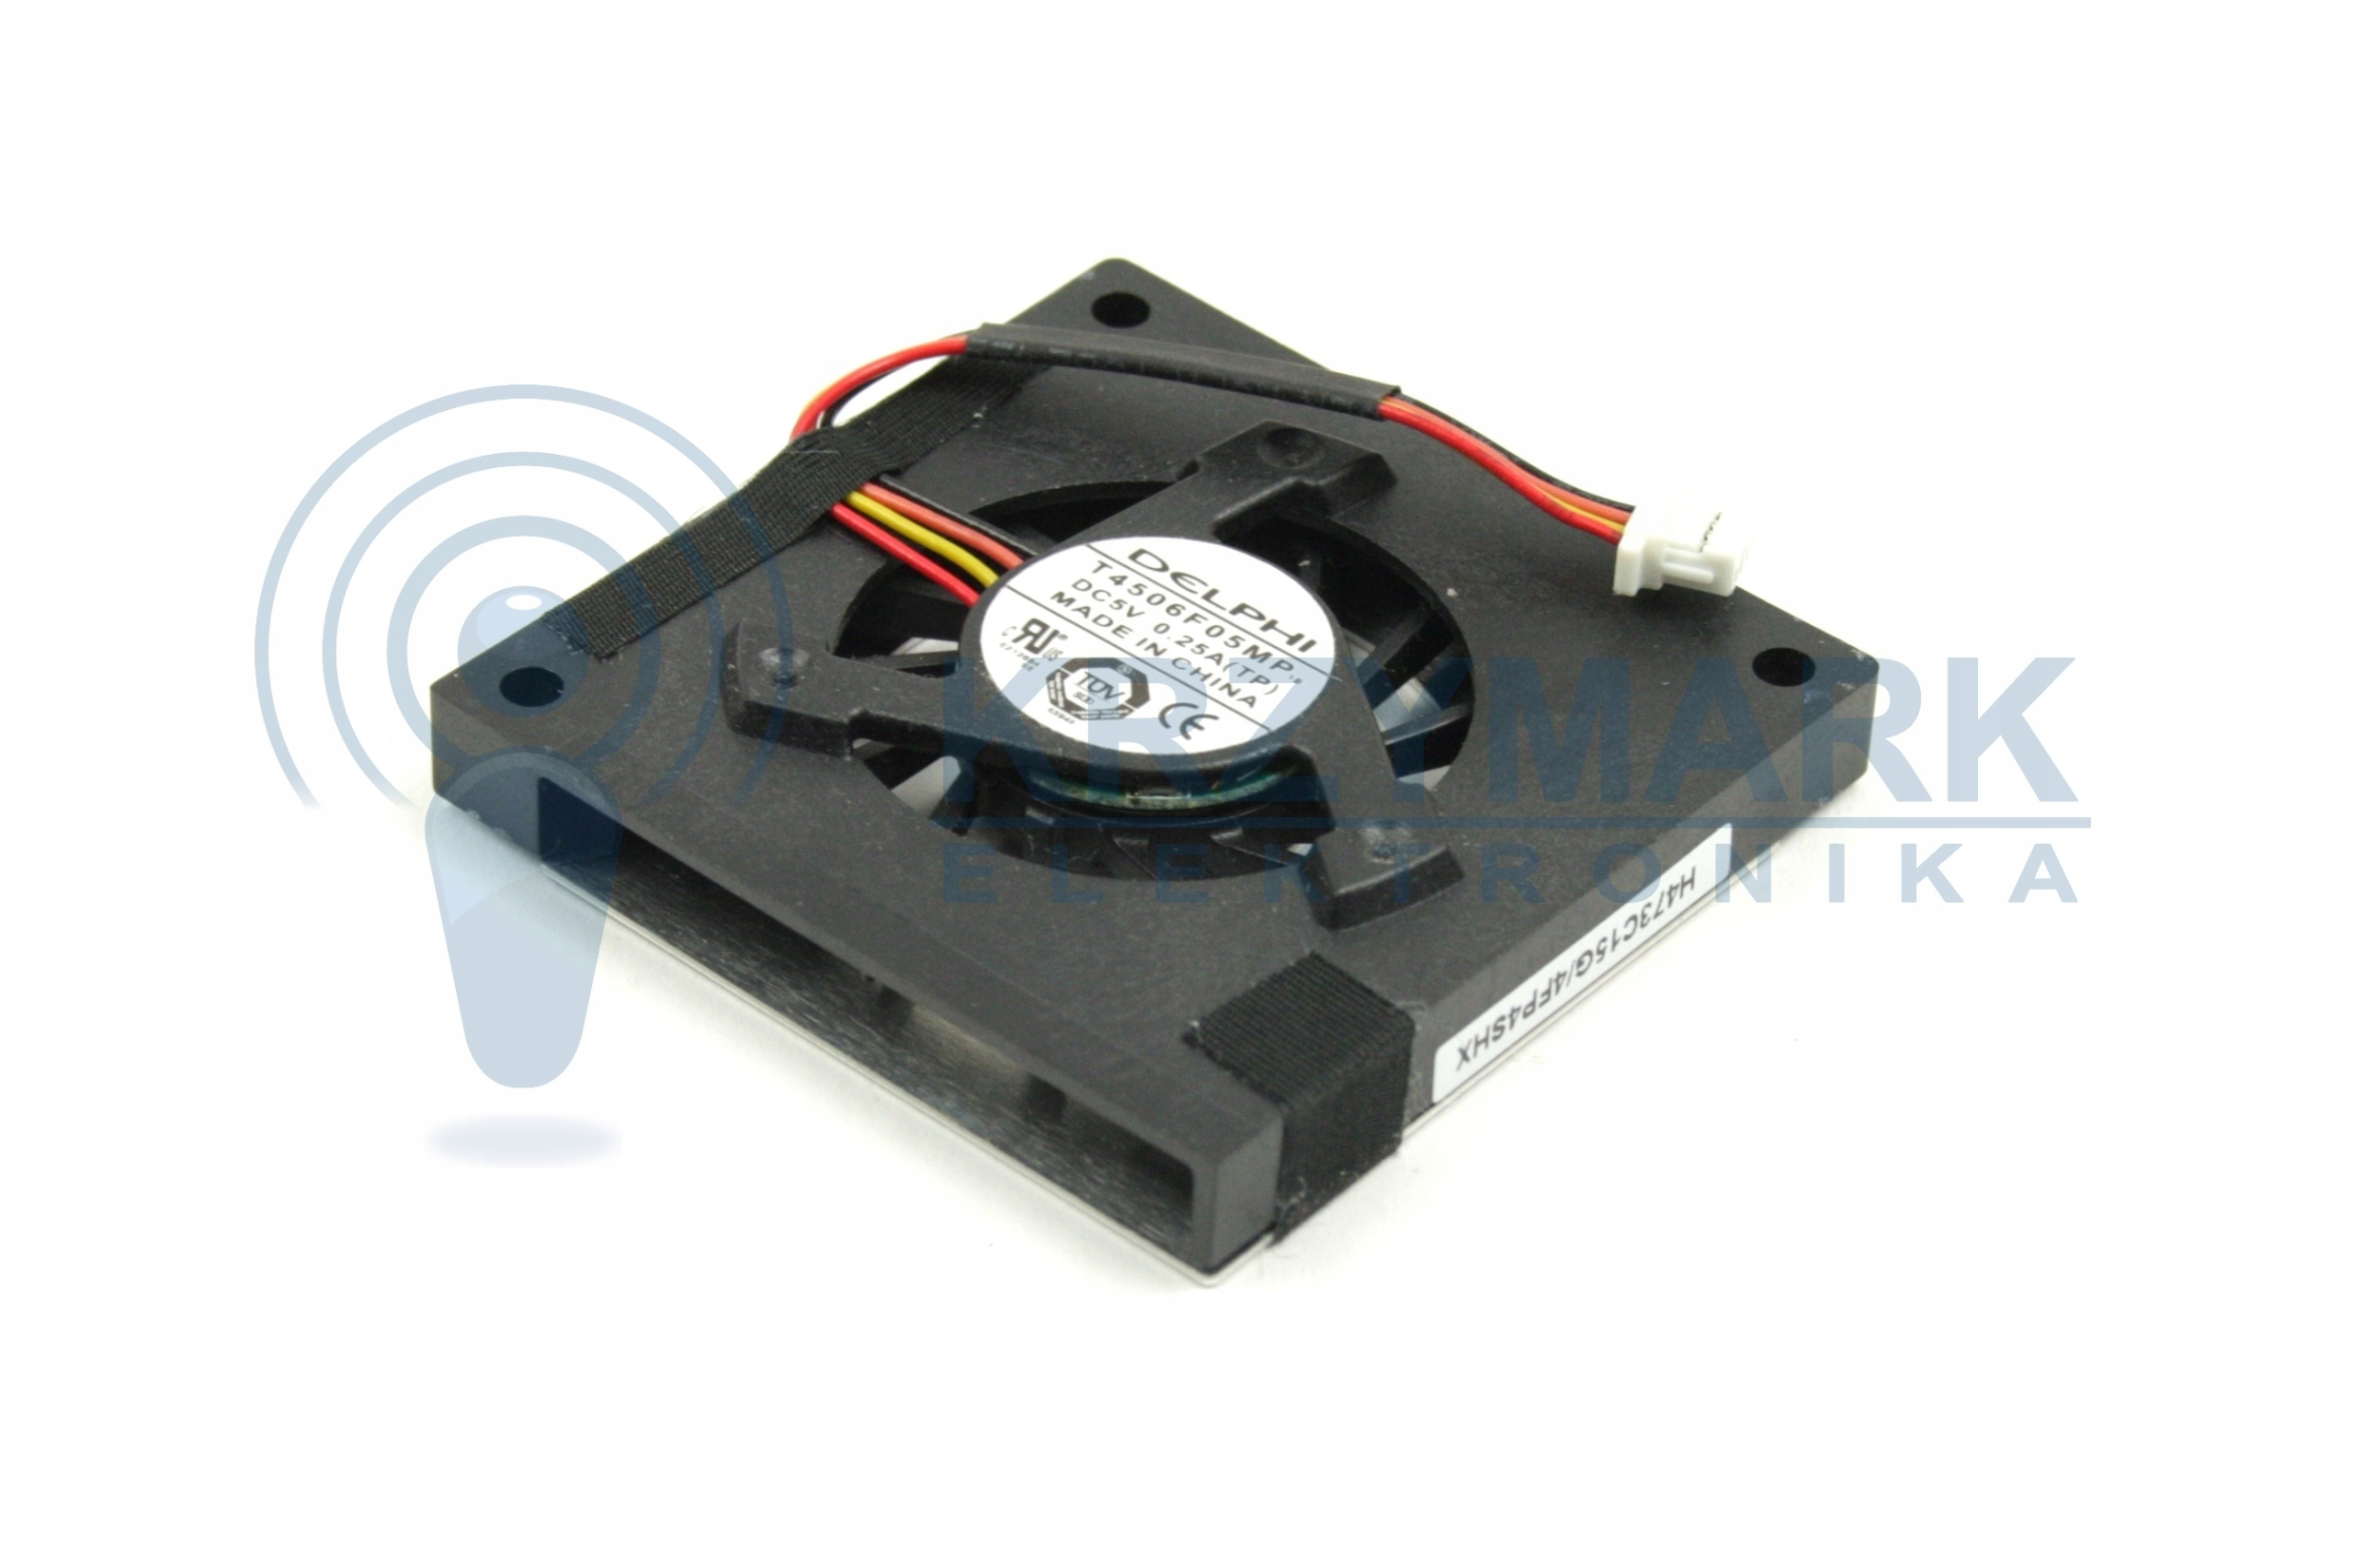 WENTYLATOR ASUS EEE PC 700 701 900 901 1000 1005HA 1008HA PC700 H455C16G T4506F05MP - Wentylatory i radiatory